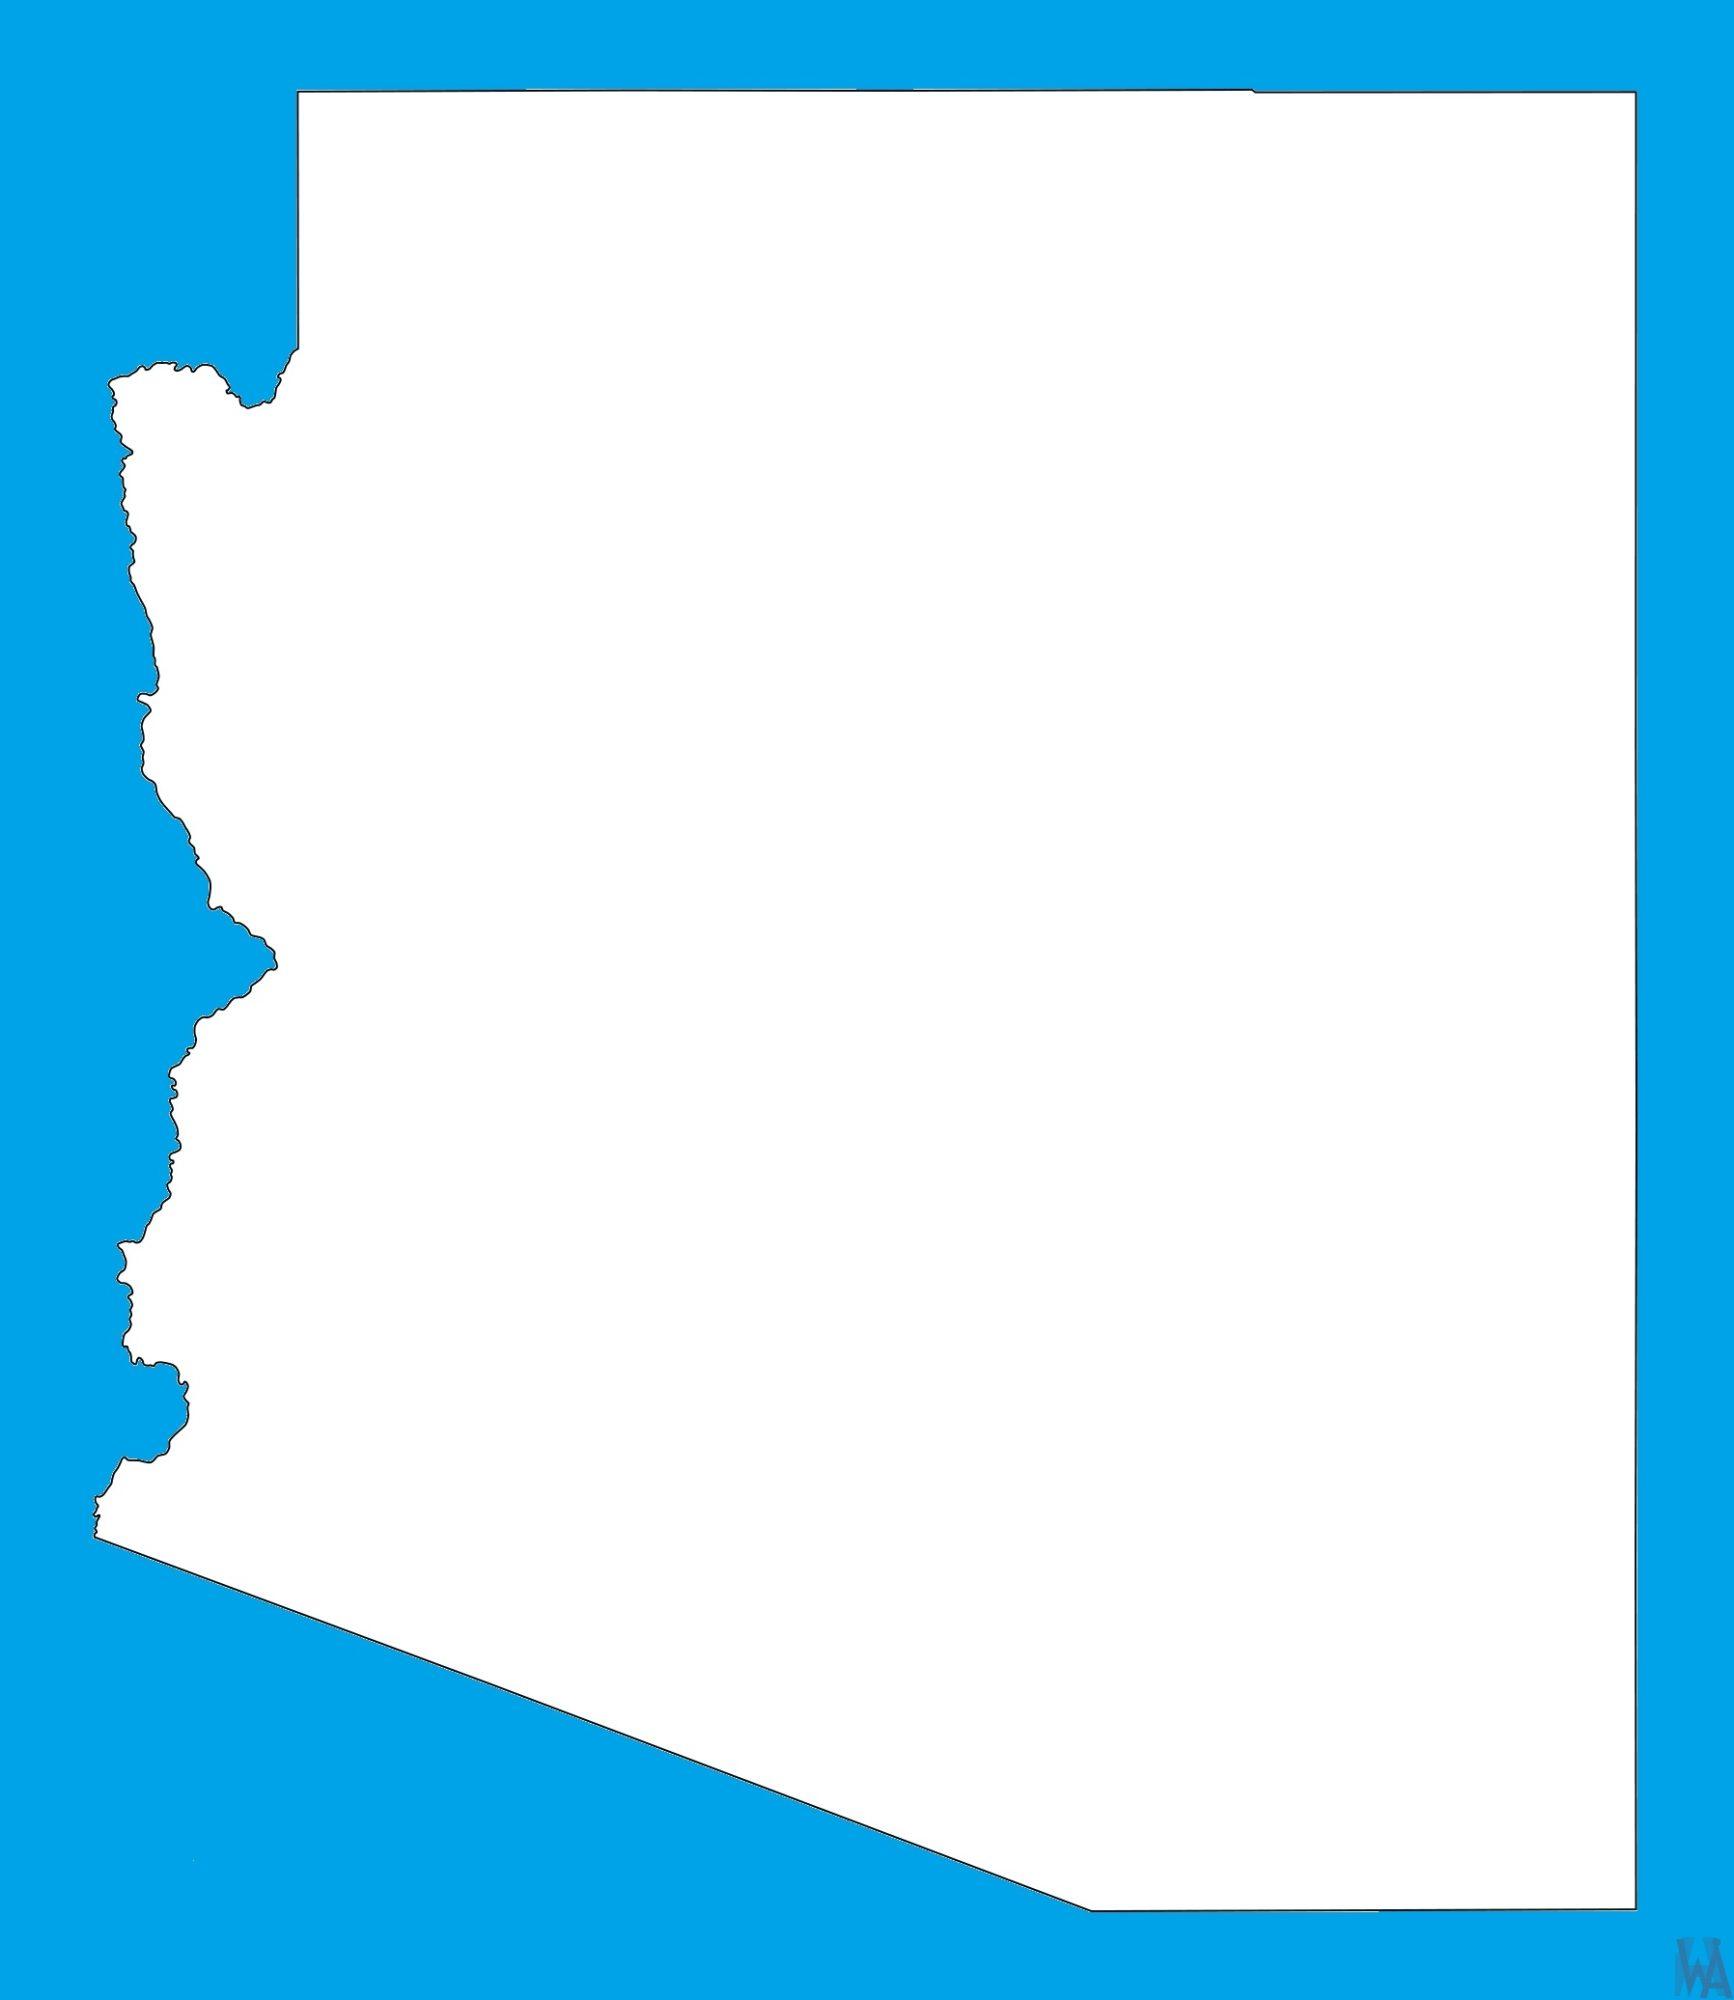 Arizona Blank Outline Map |  Blank Outline Map of Arizona